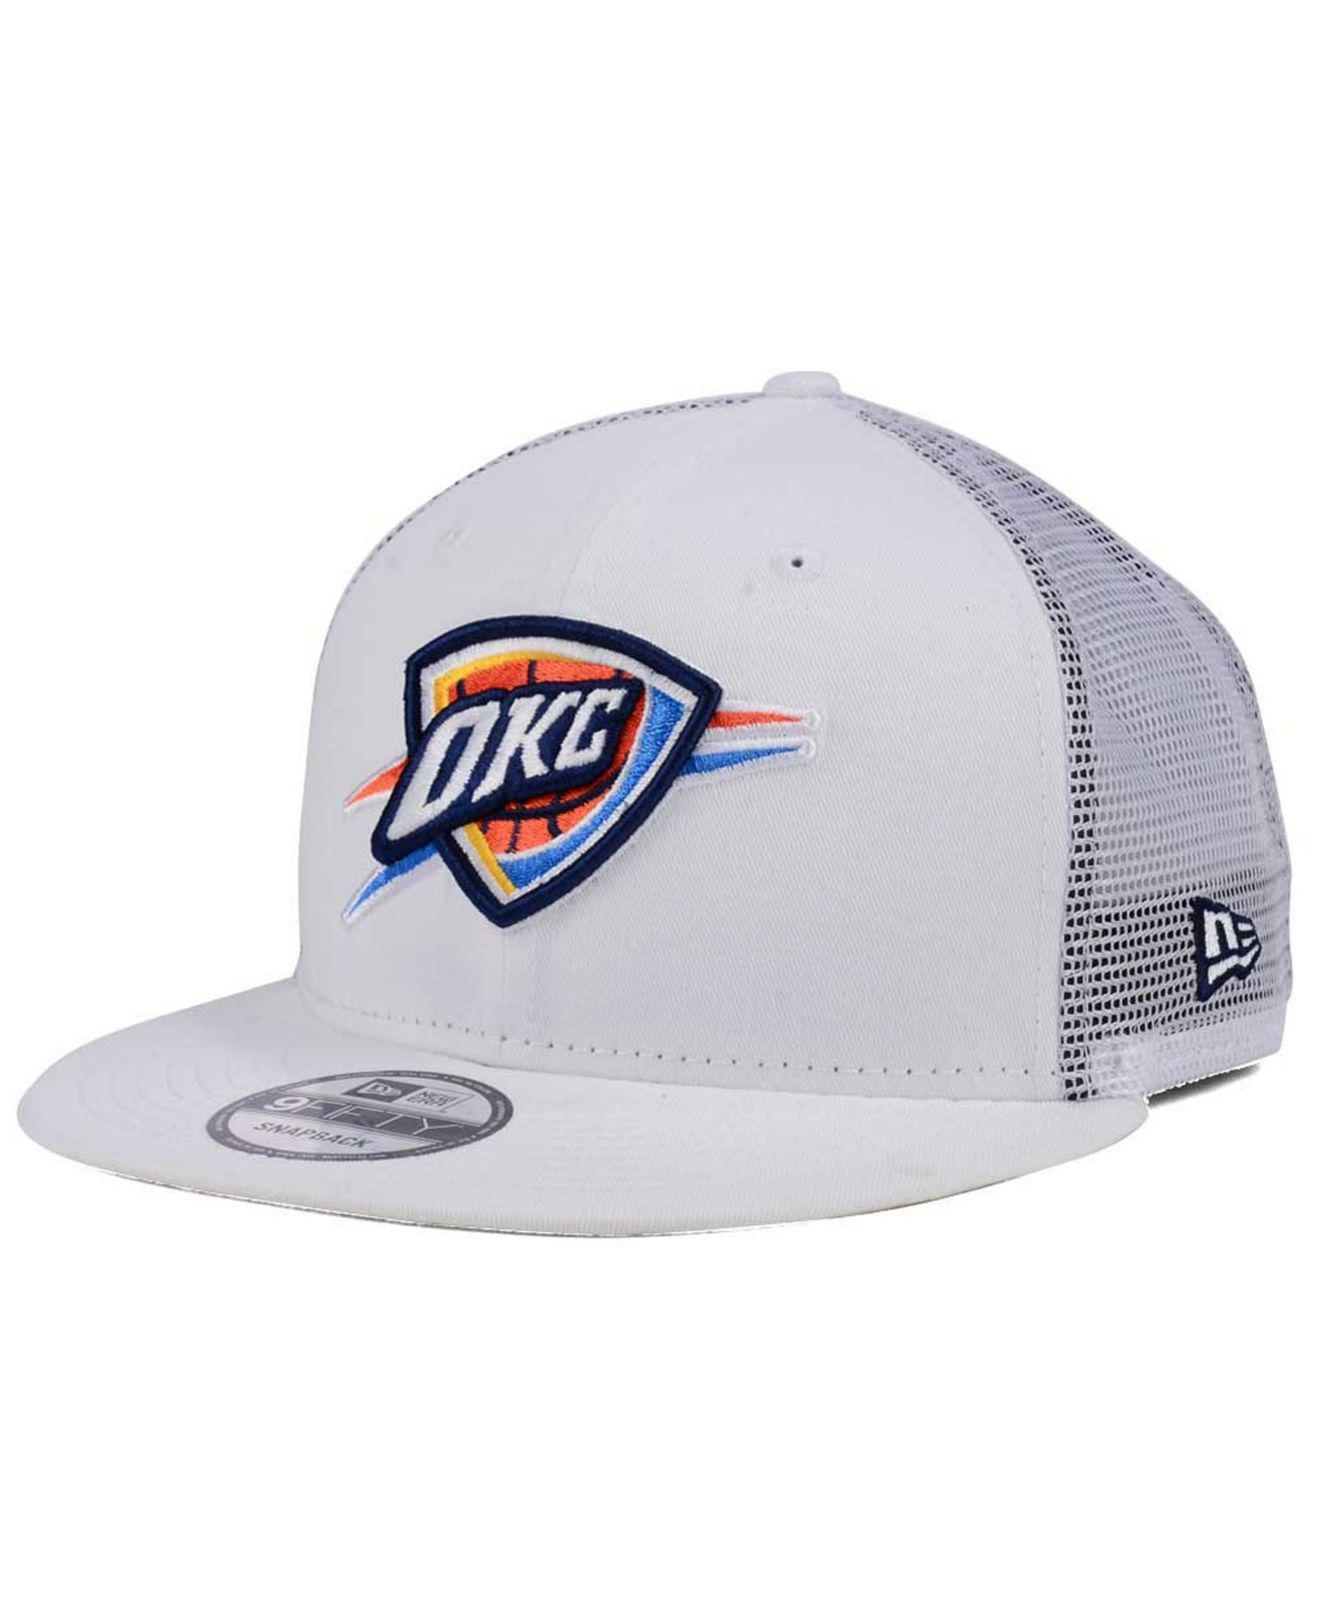 Lyst - Ktz Summer Time Mesh 9fifty Snapback Cap in White for Men 78284d11d33c